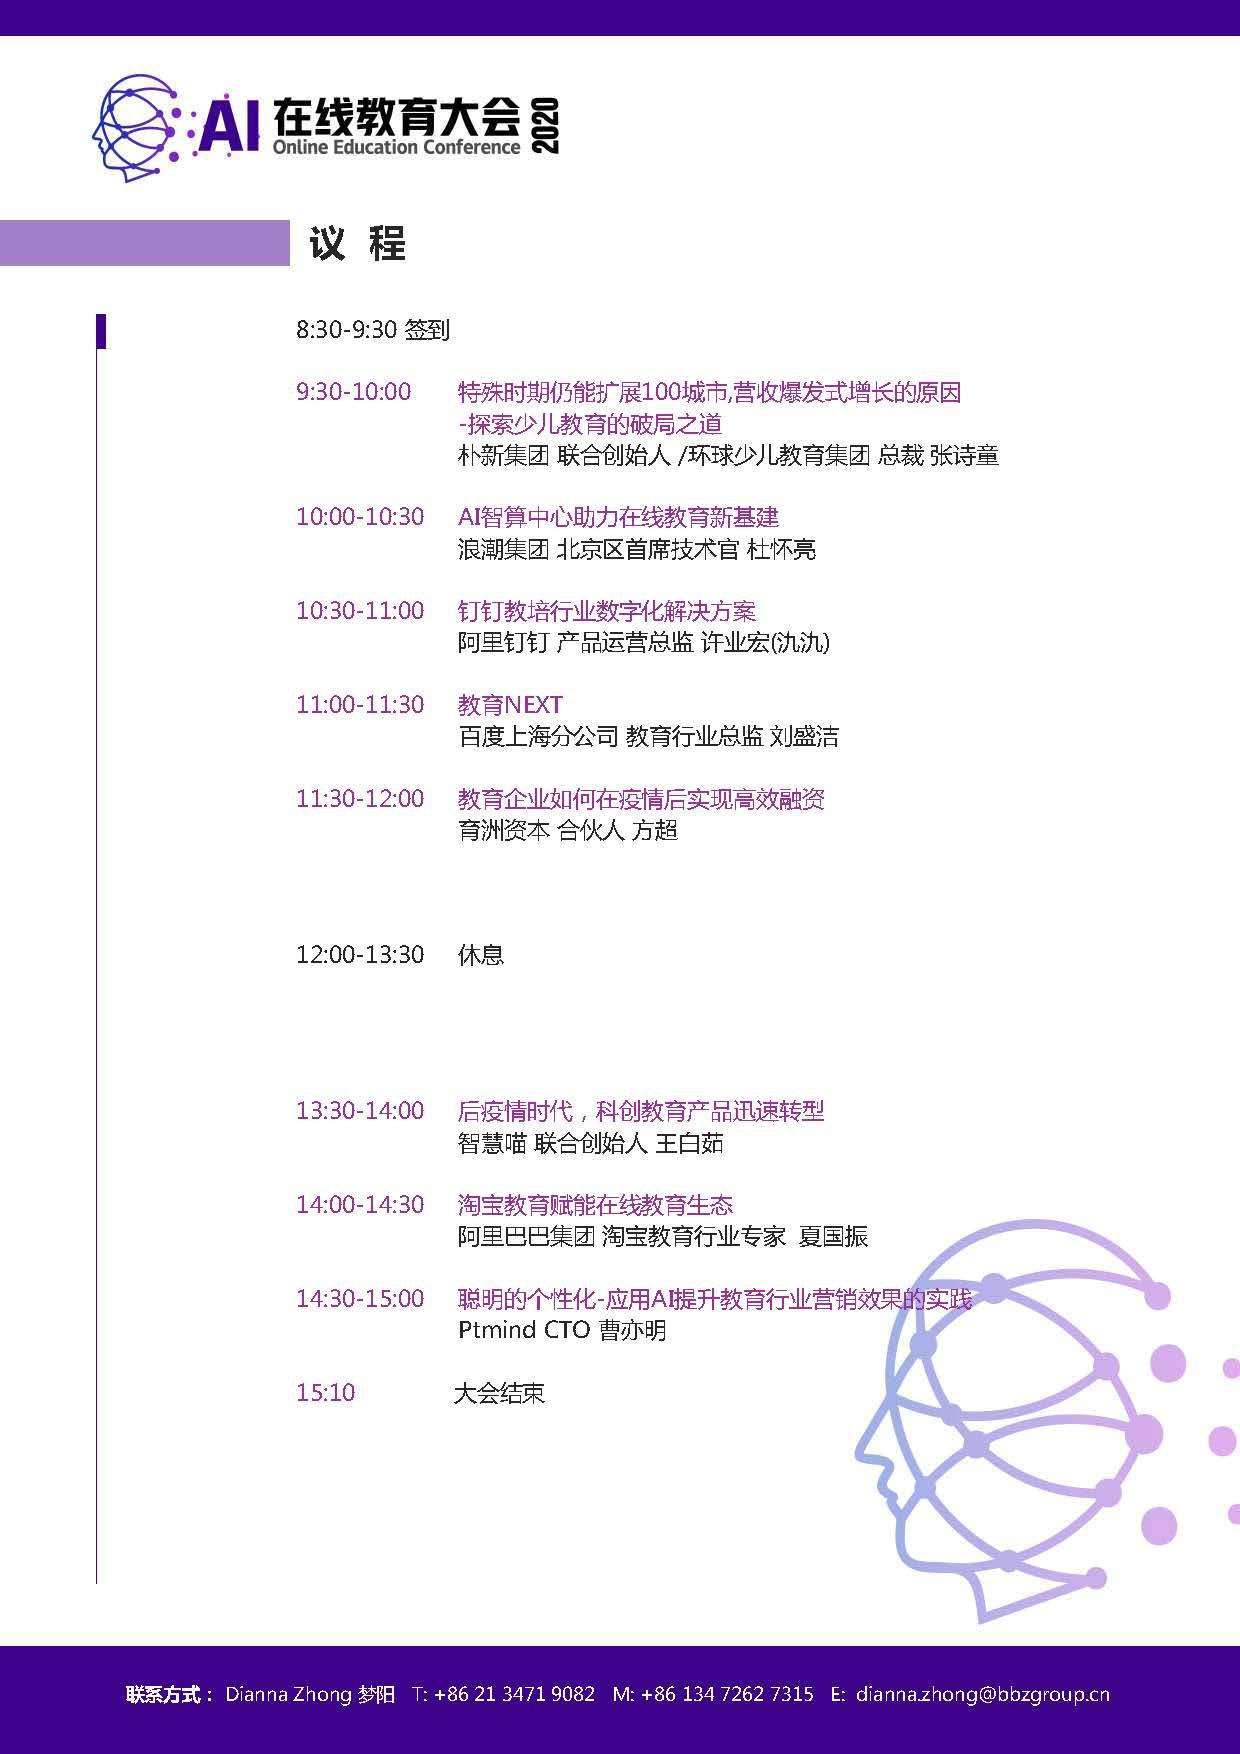 AI在线教育大会 上海 2020.06.17